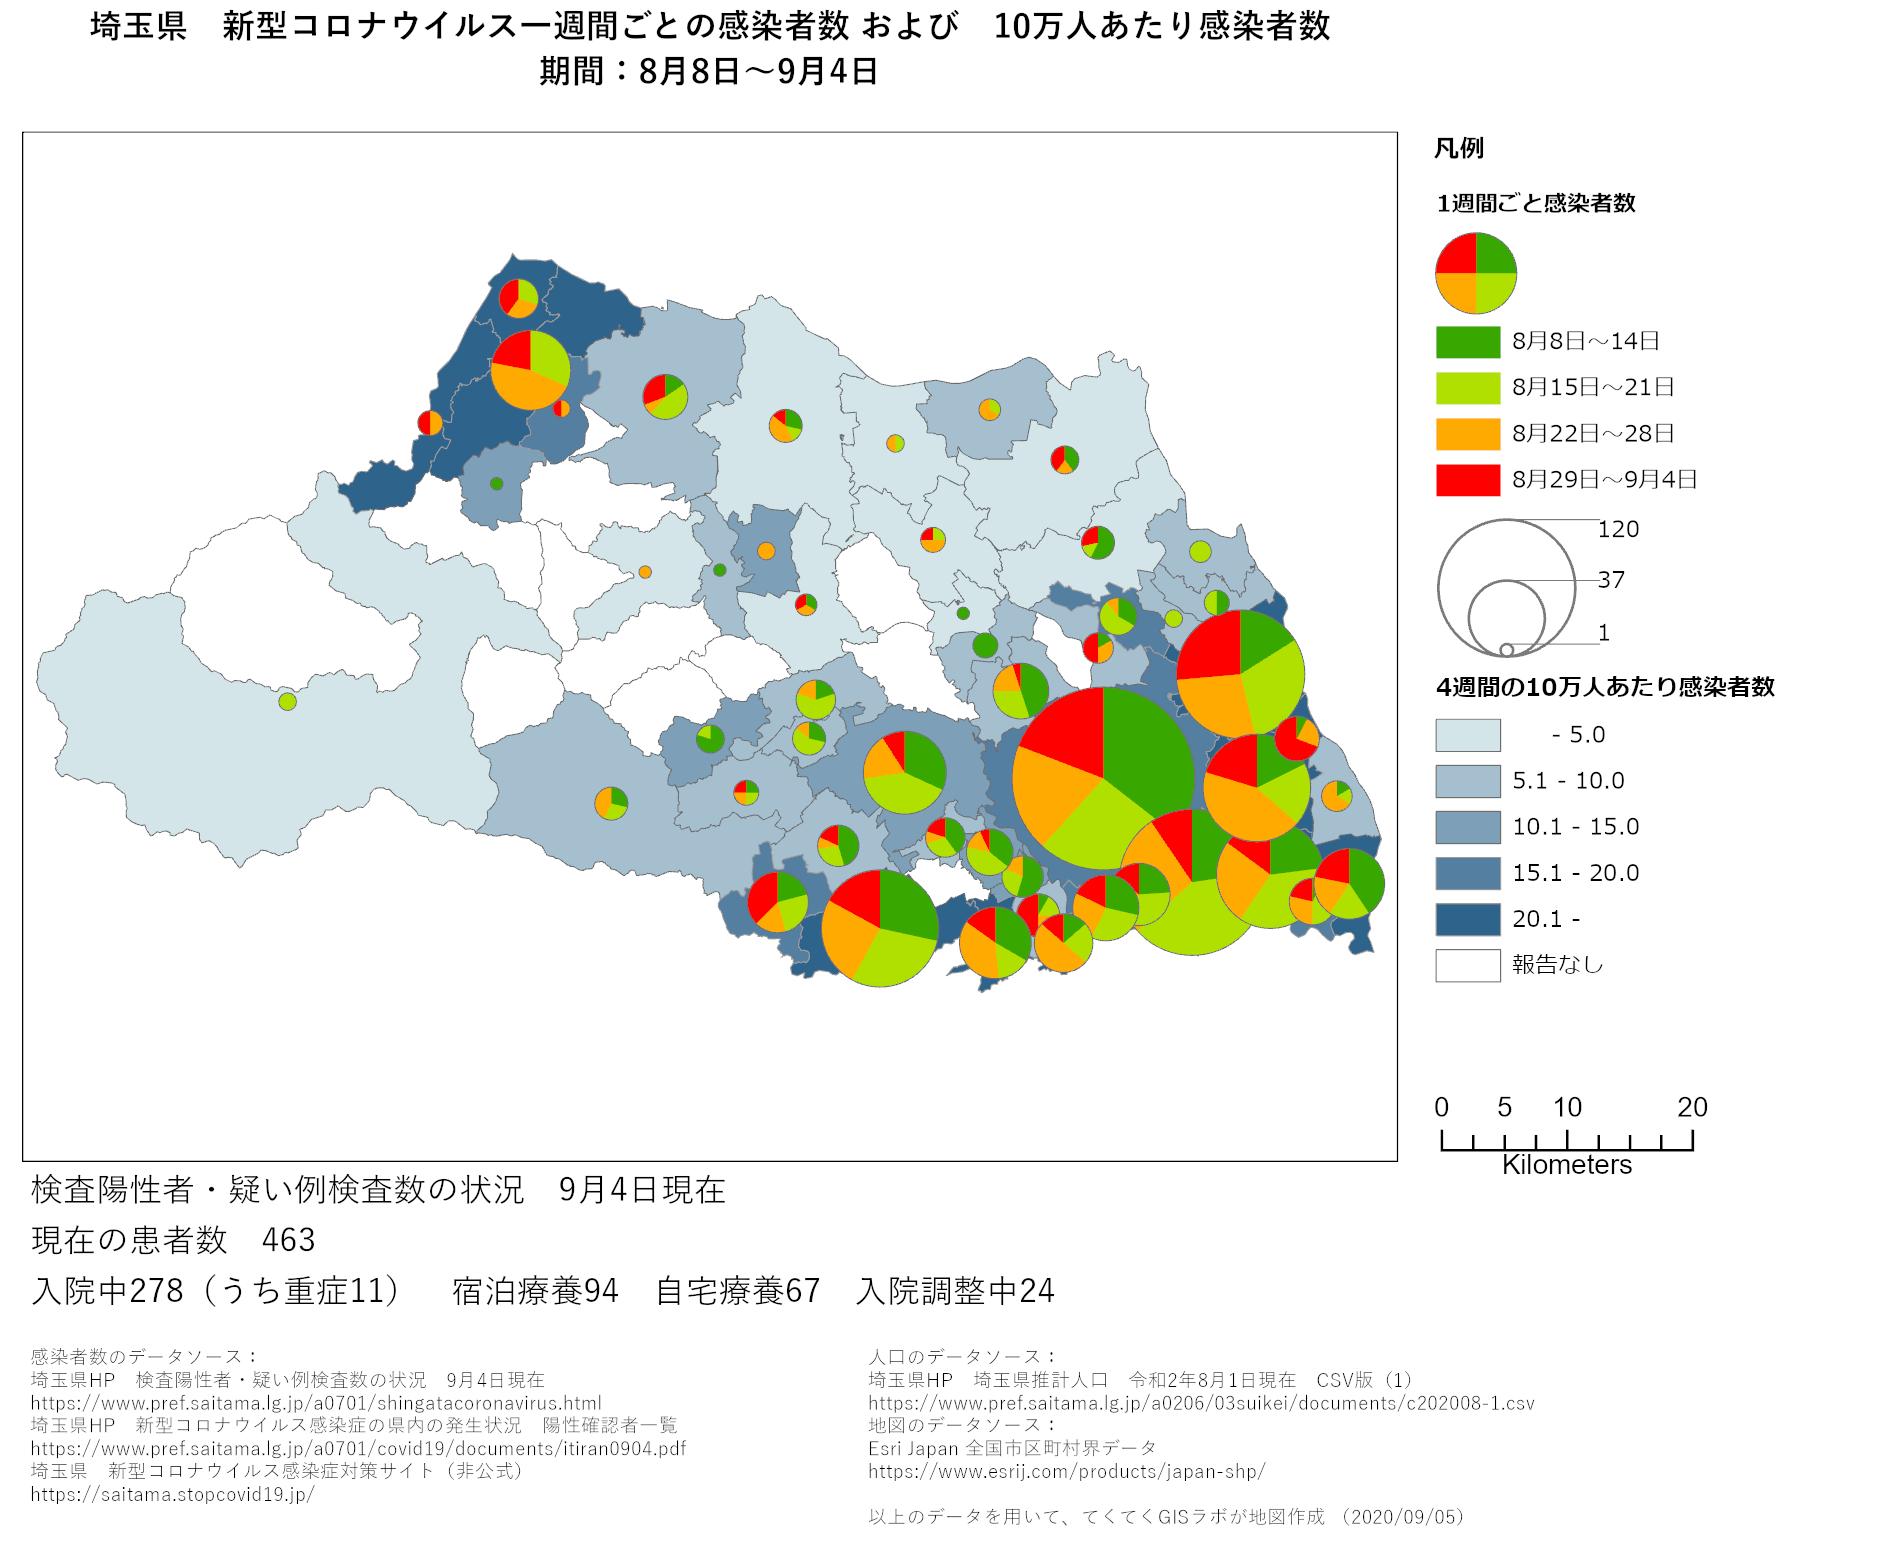 1週間ごと感染者数、埼玉県、8月8日〜9月4日